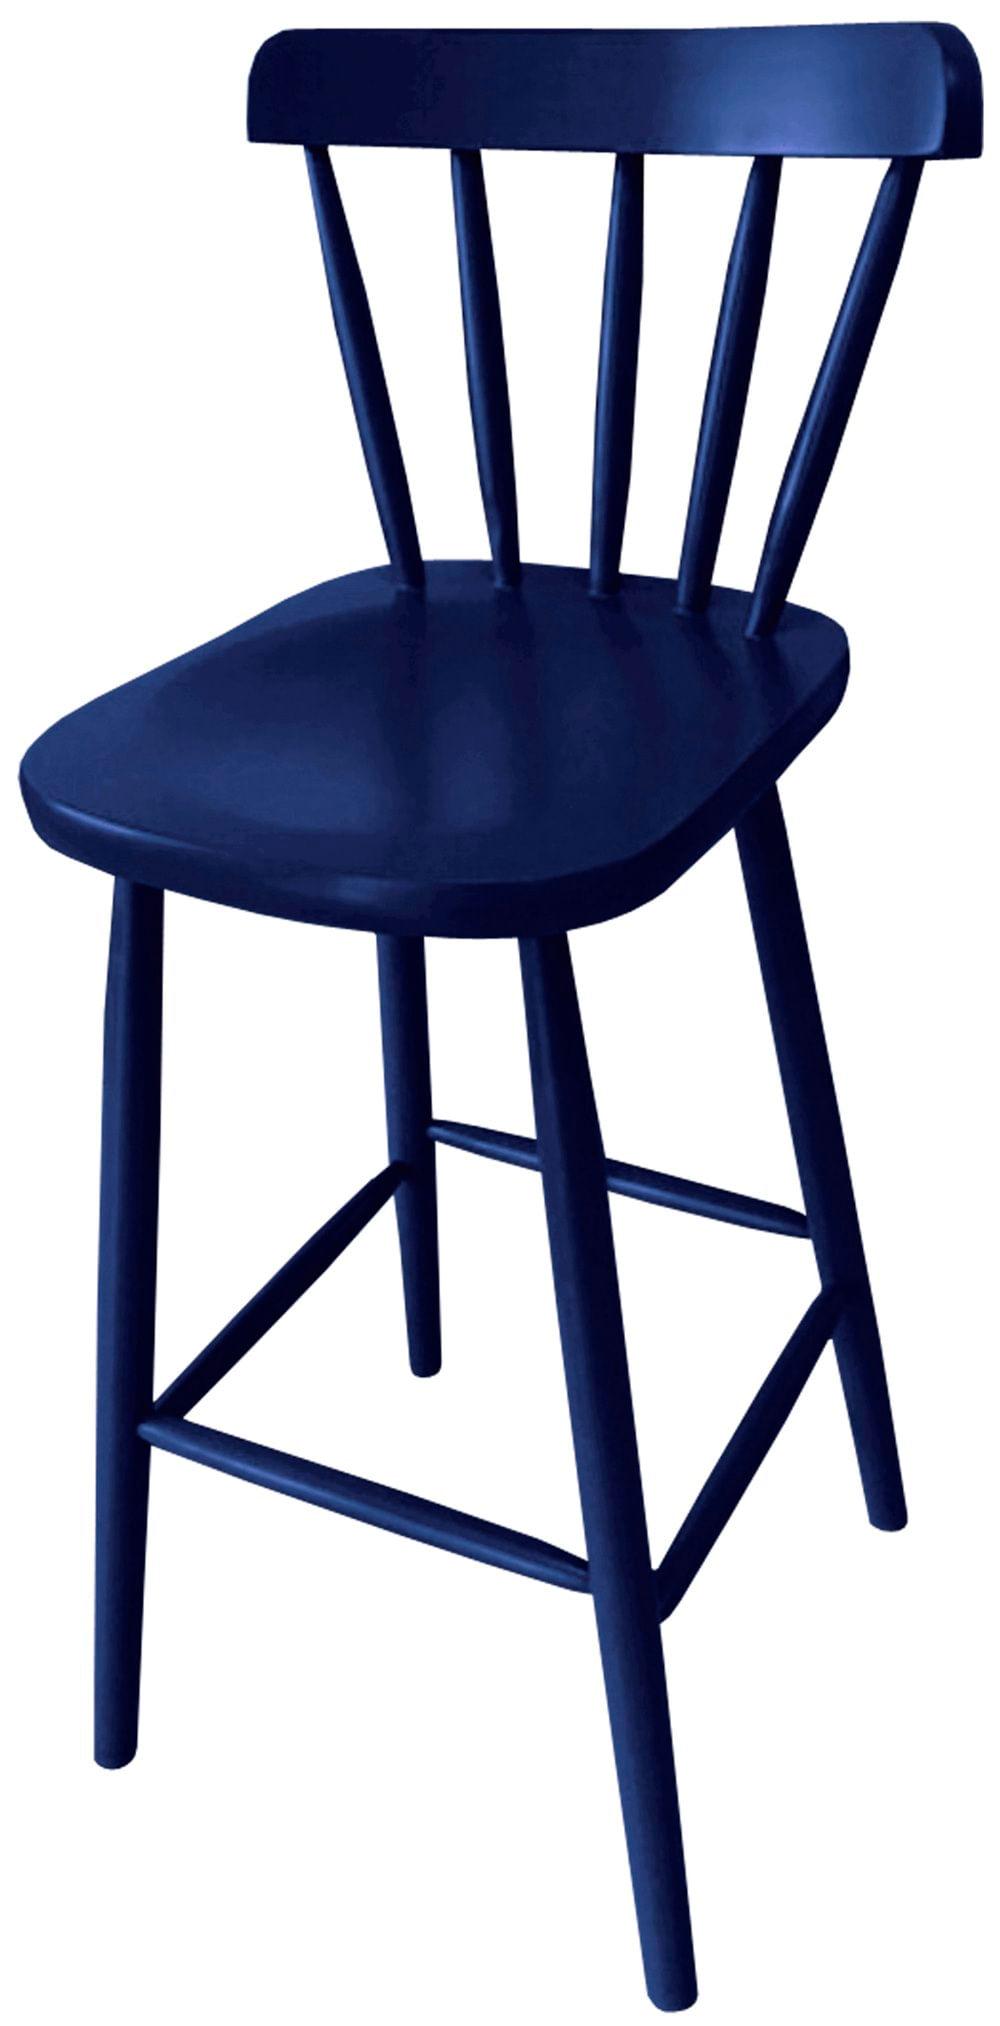 Banqueta Skand Assento Escavado Cor Azul 72 cm (ALT) - 33371